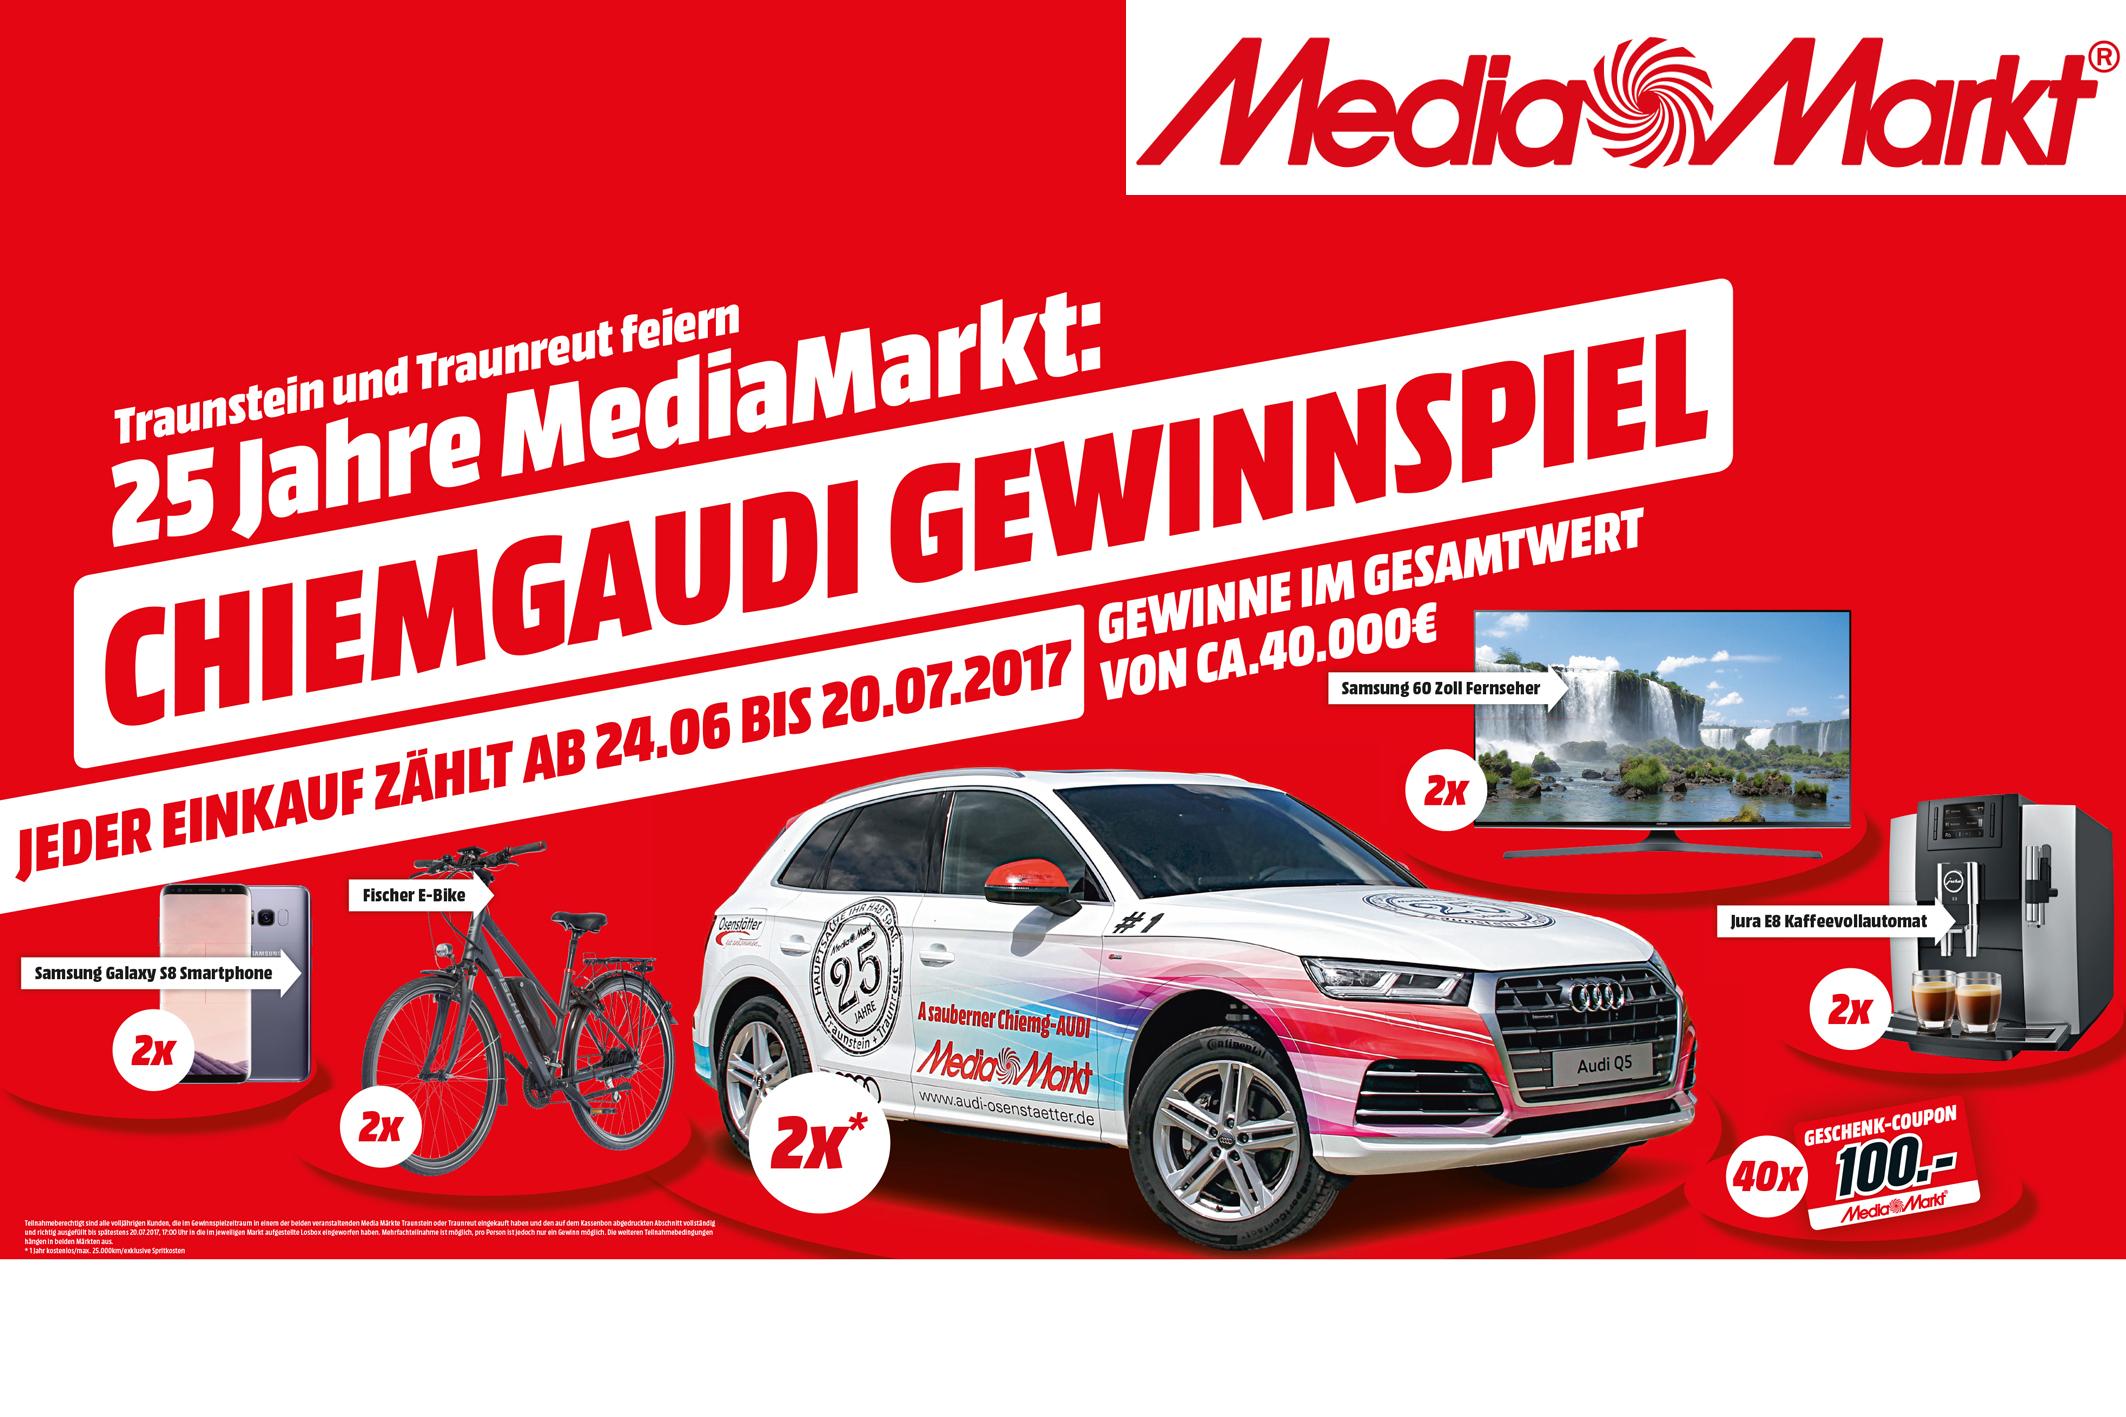 gewinnspiel mb-media.de